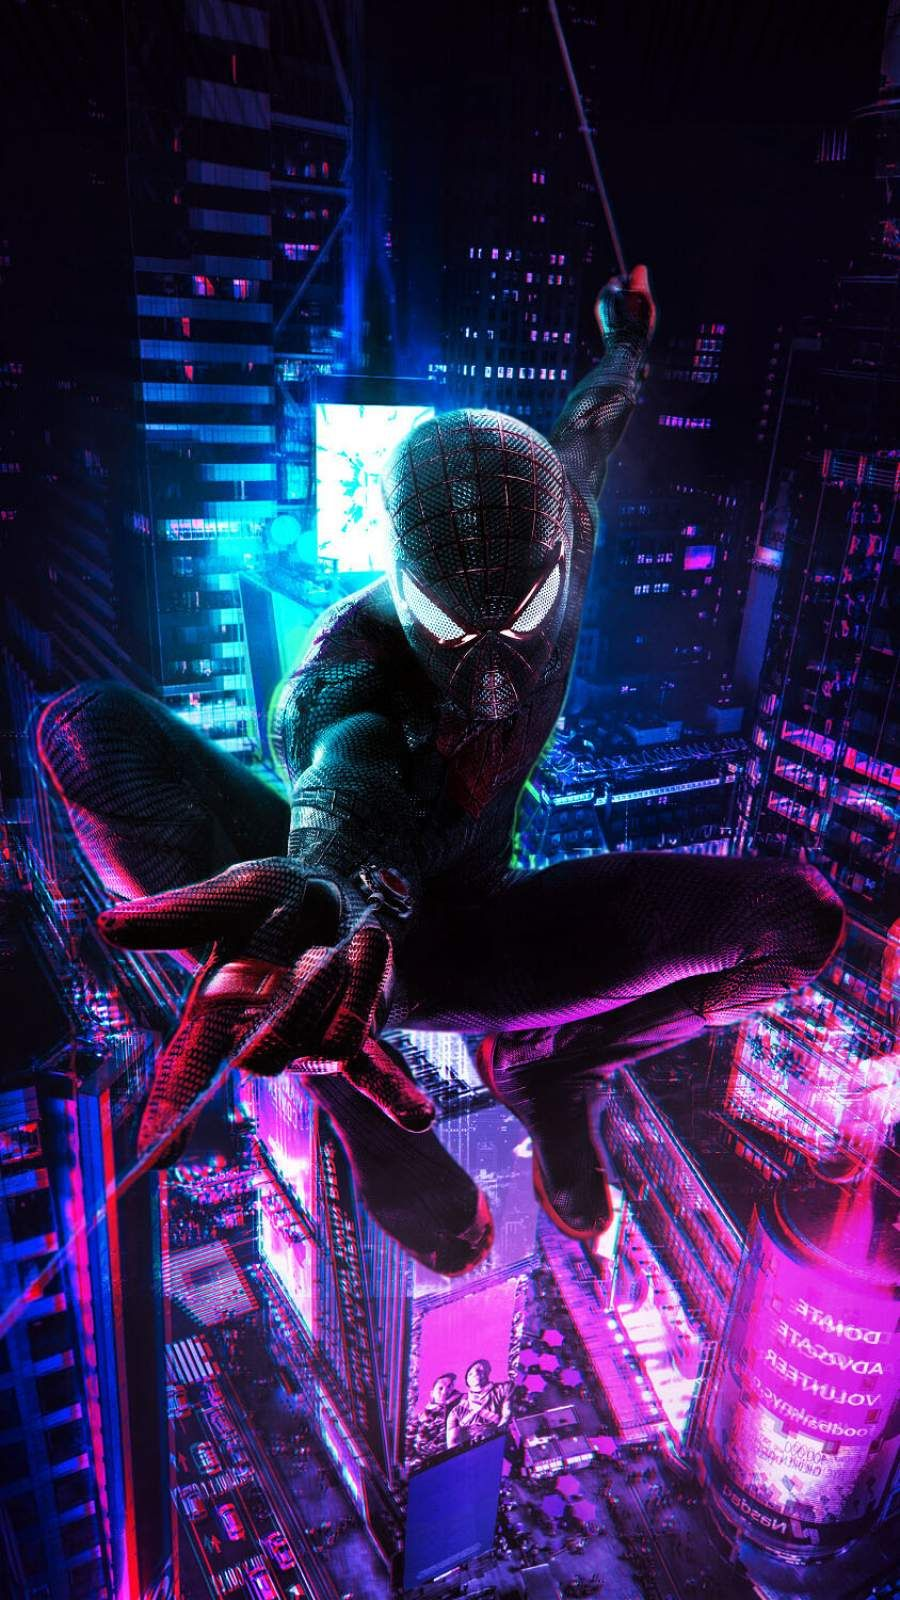 Spiderman Cyberpunk Iphone Wallpaper Fondo De Pantalla De Avengers Fondo De Pantalla De Humo Fondo De Pantalla De Nueva York